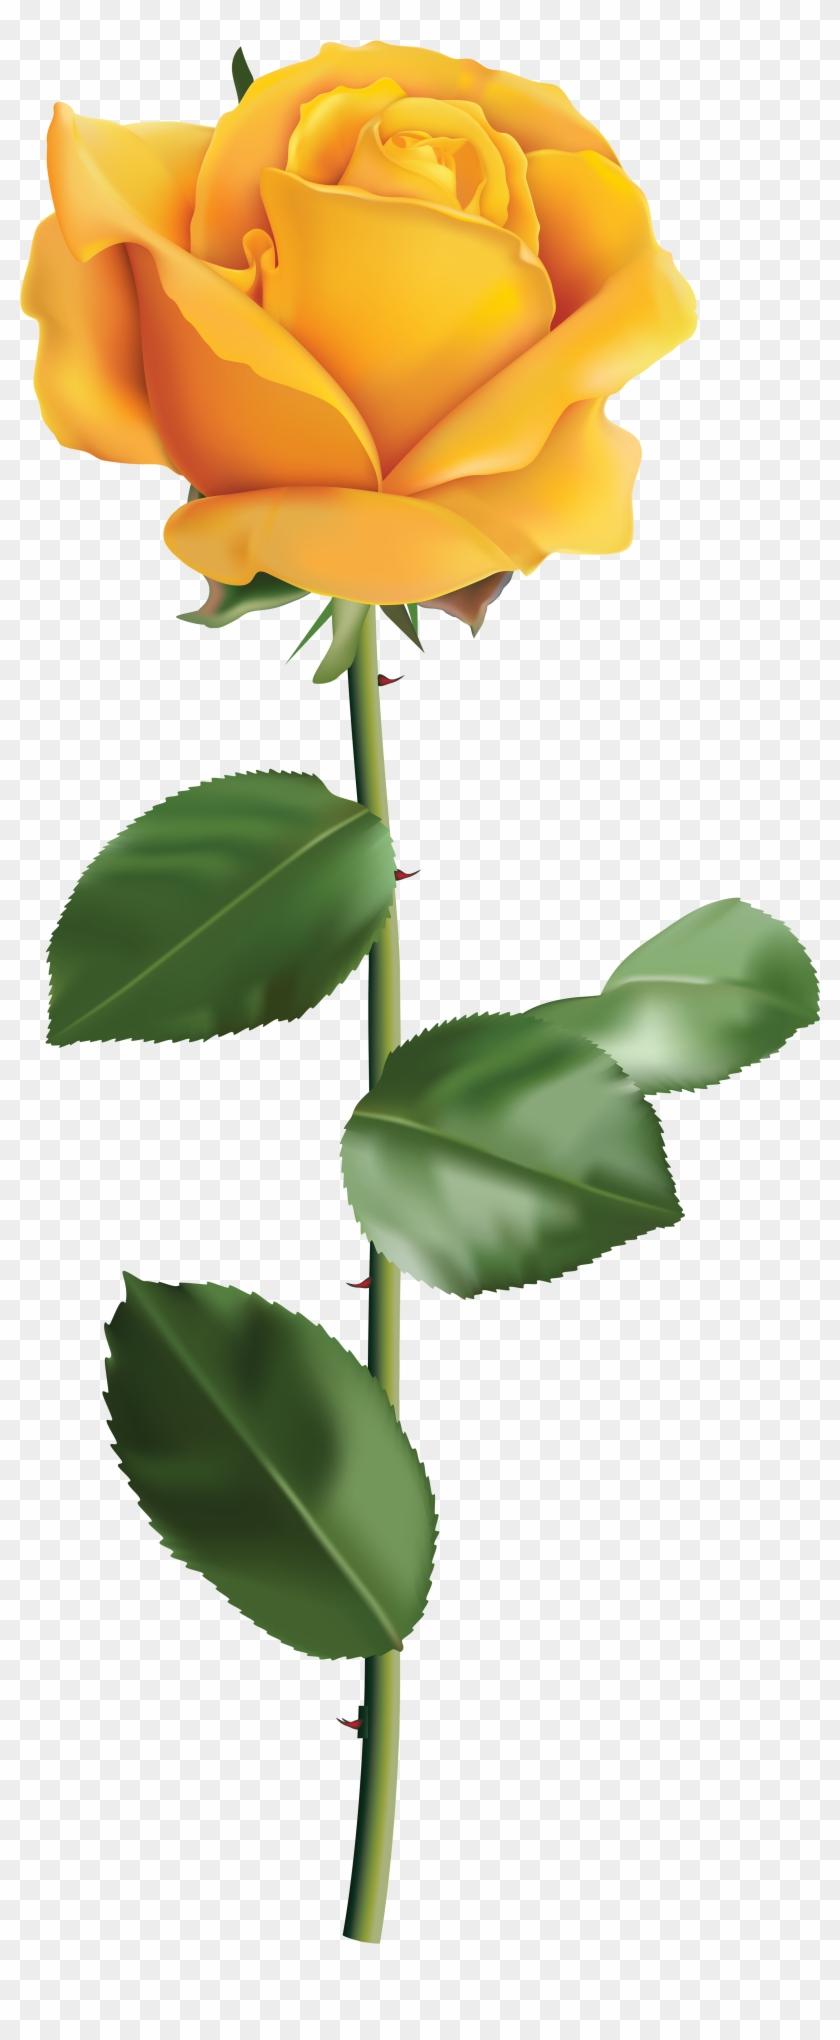 Yellow Rose Transparent Png Clip Art Image.